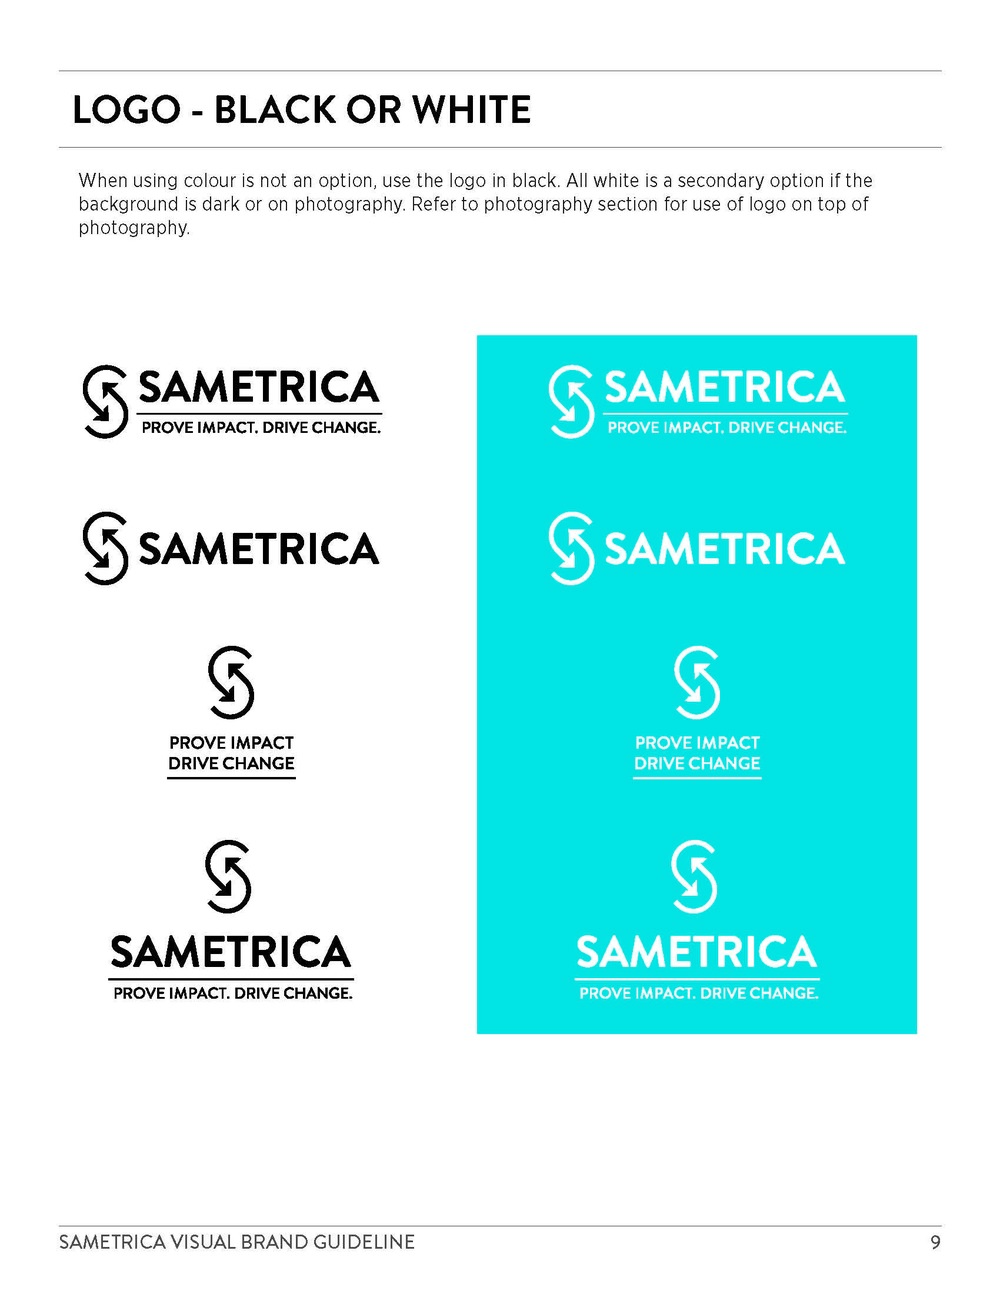 150911_SAMETRICA Brand Guideline_Page_09.jpg